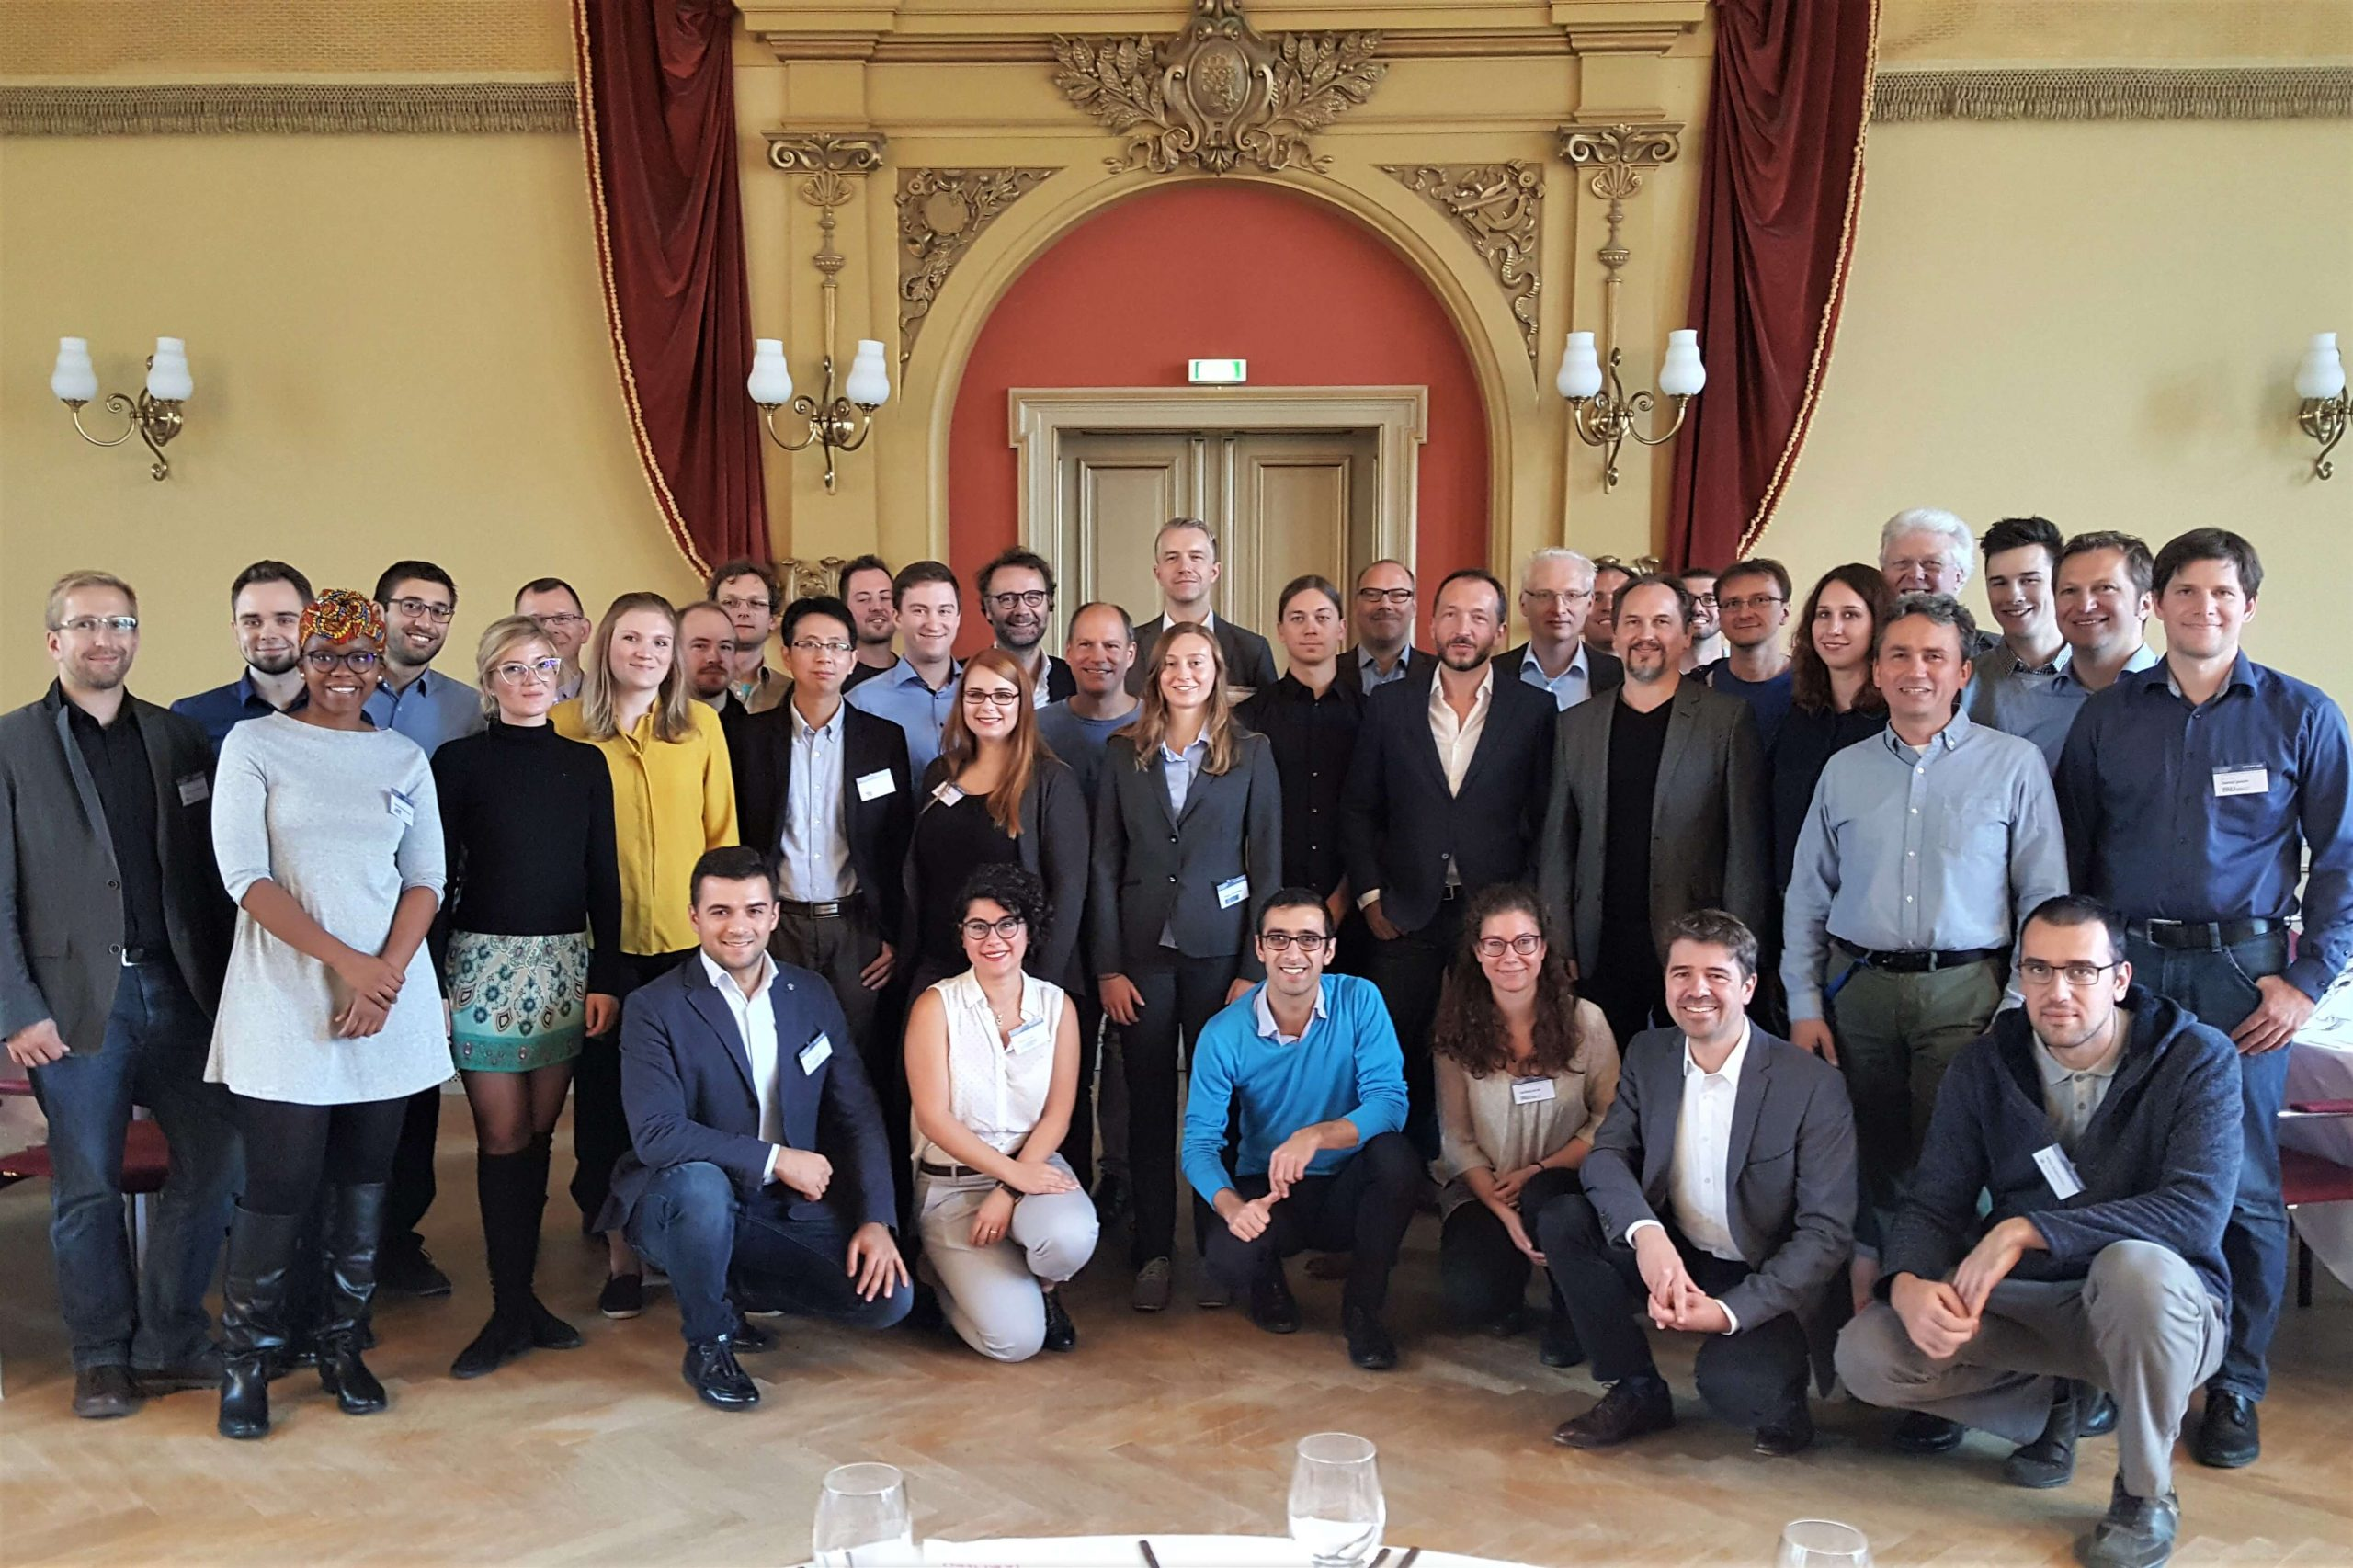 1st annual meeting, Dresden, 27.-28.09.2018